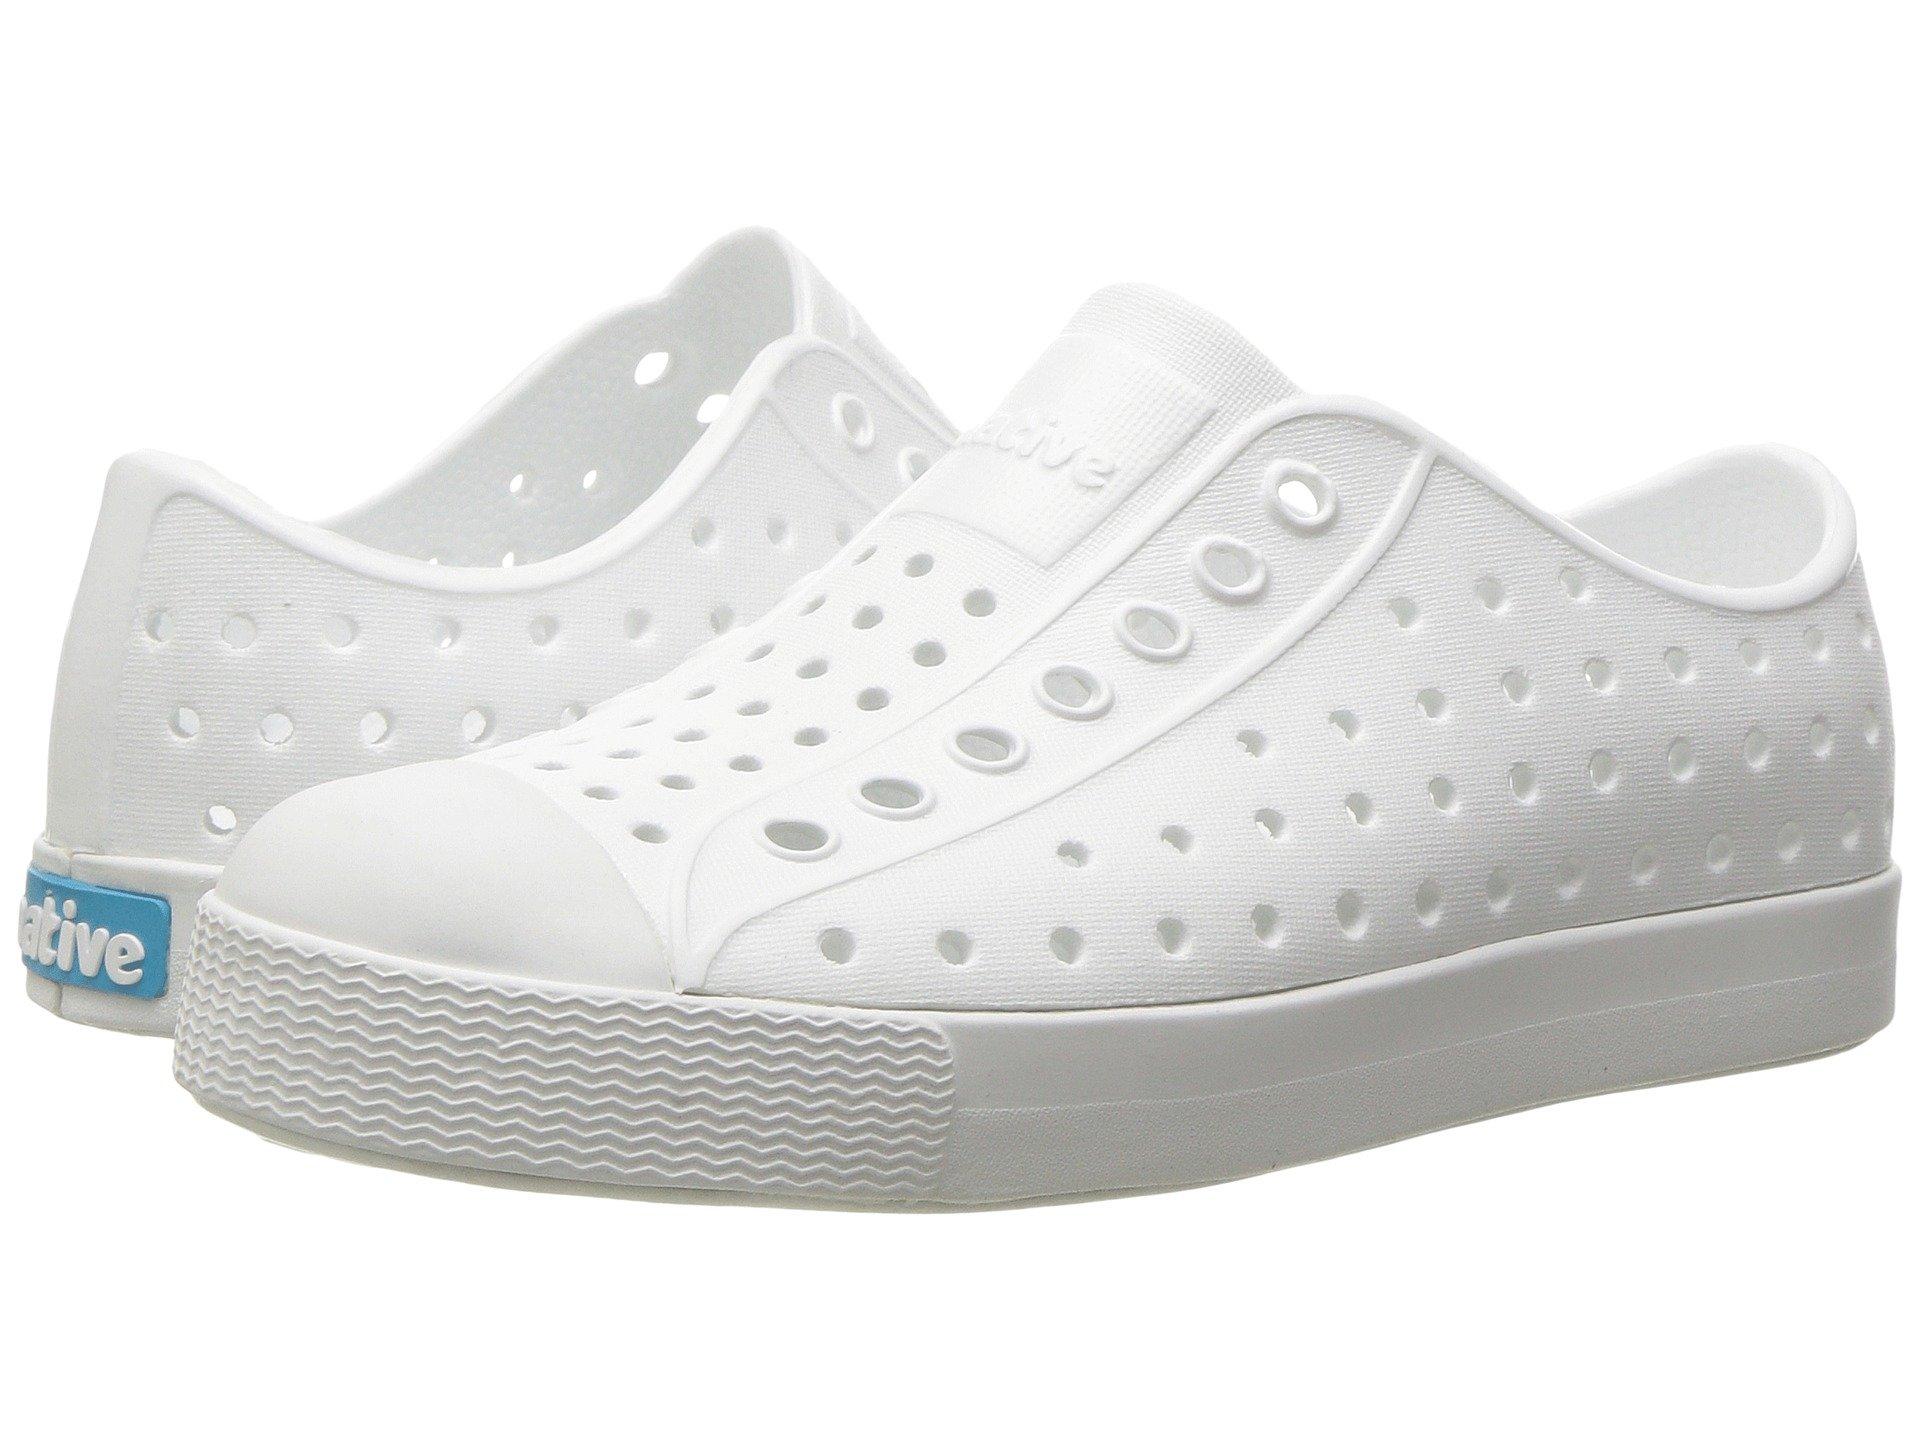 Native Jefferson Shoes Size